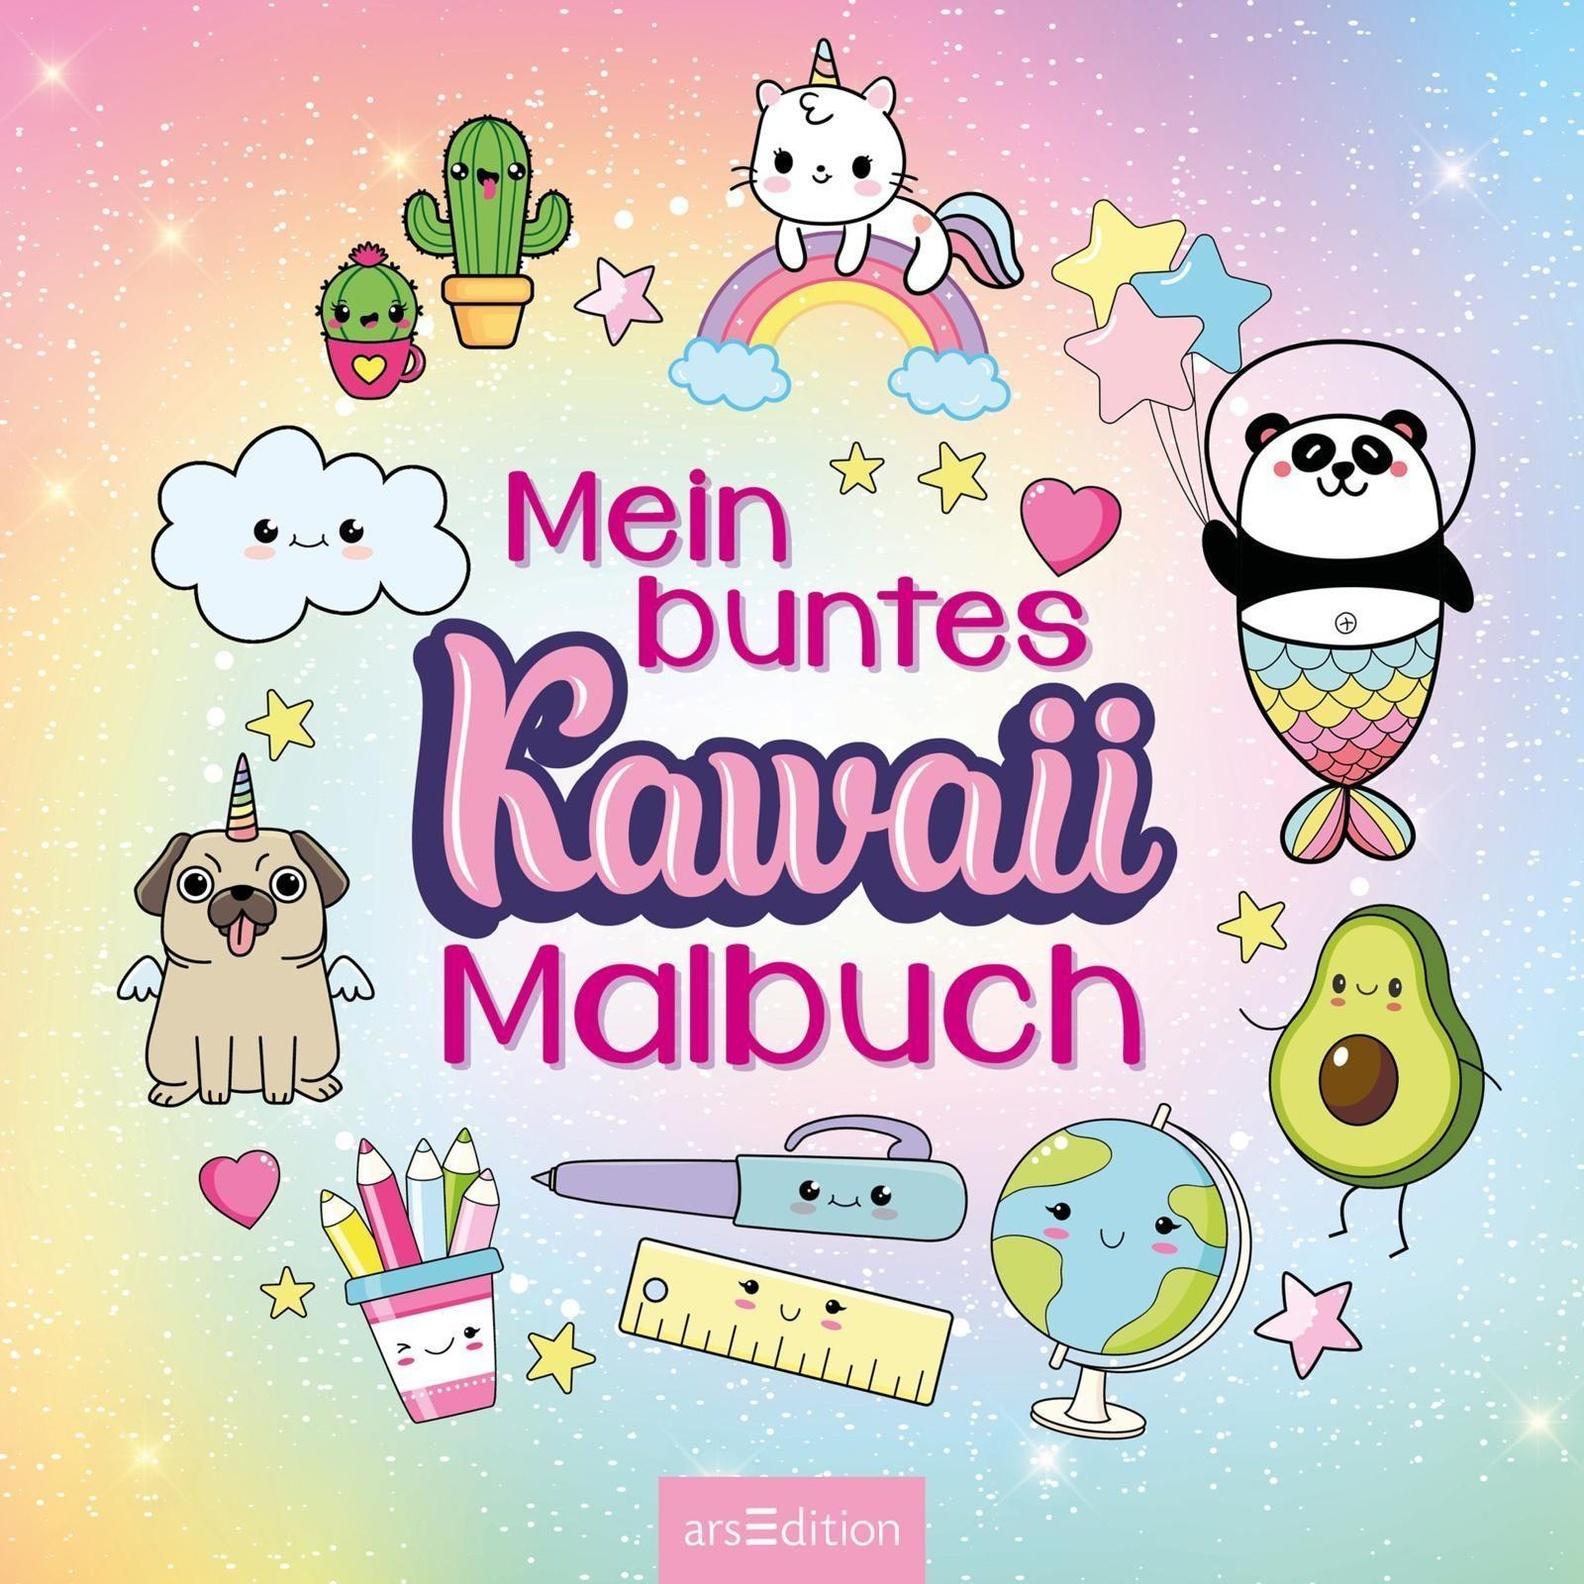 Mein Buntes Kawaii-Malbuch Buch Versandkostenfrei Bei Weltbild De